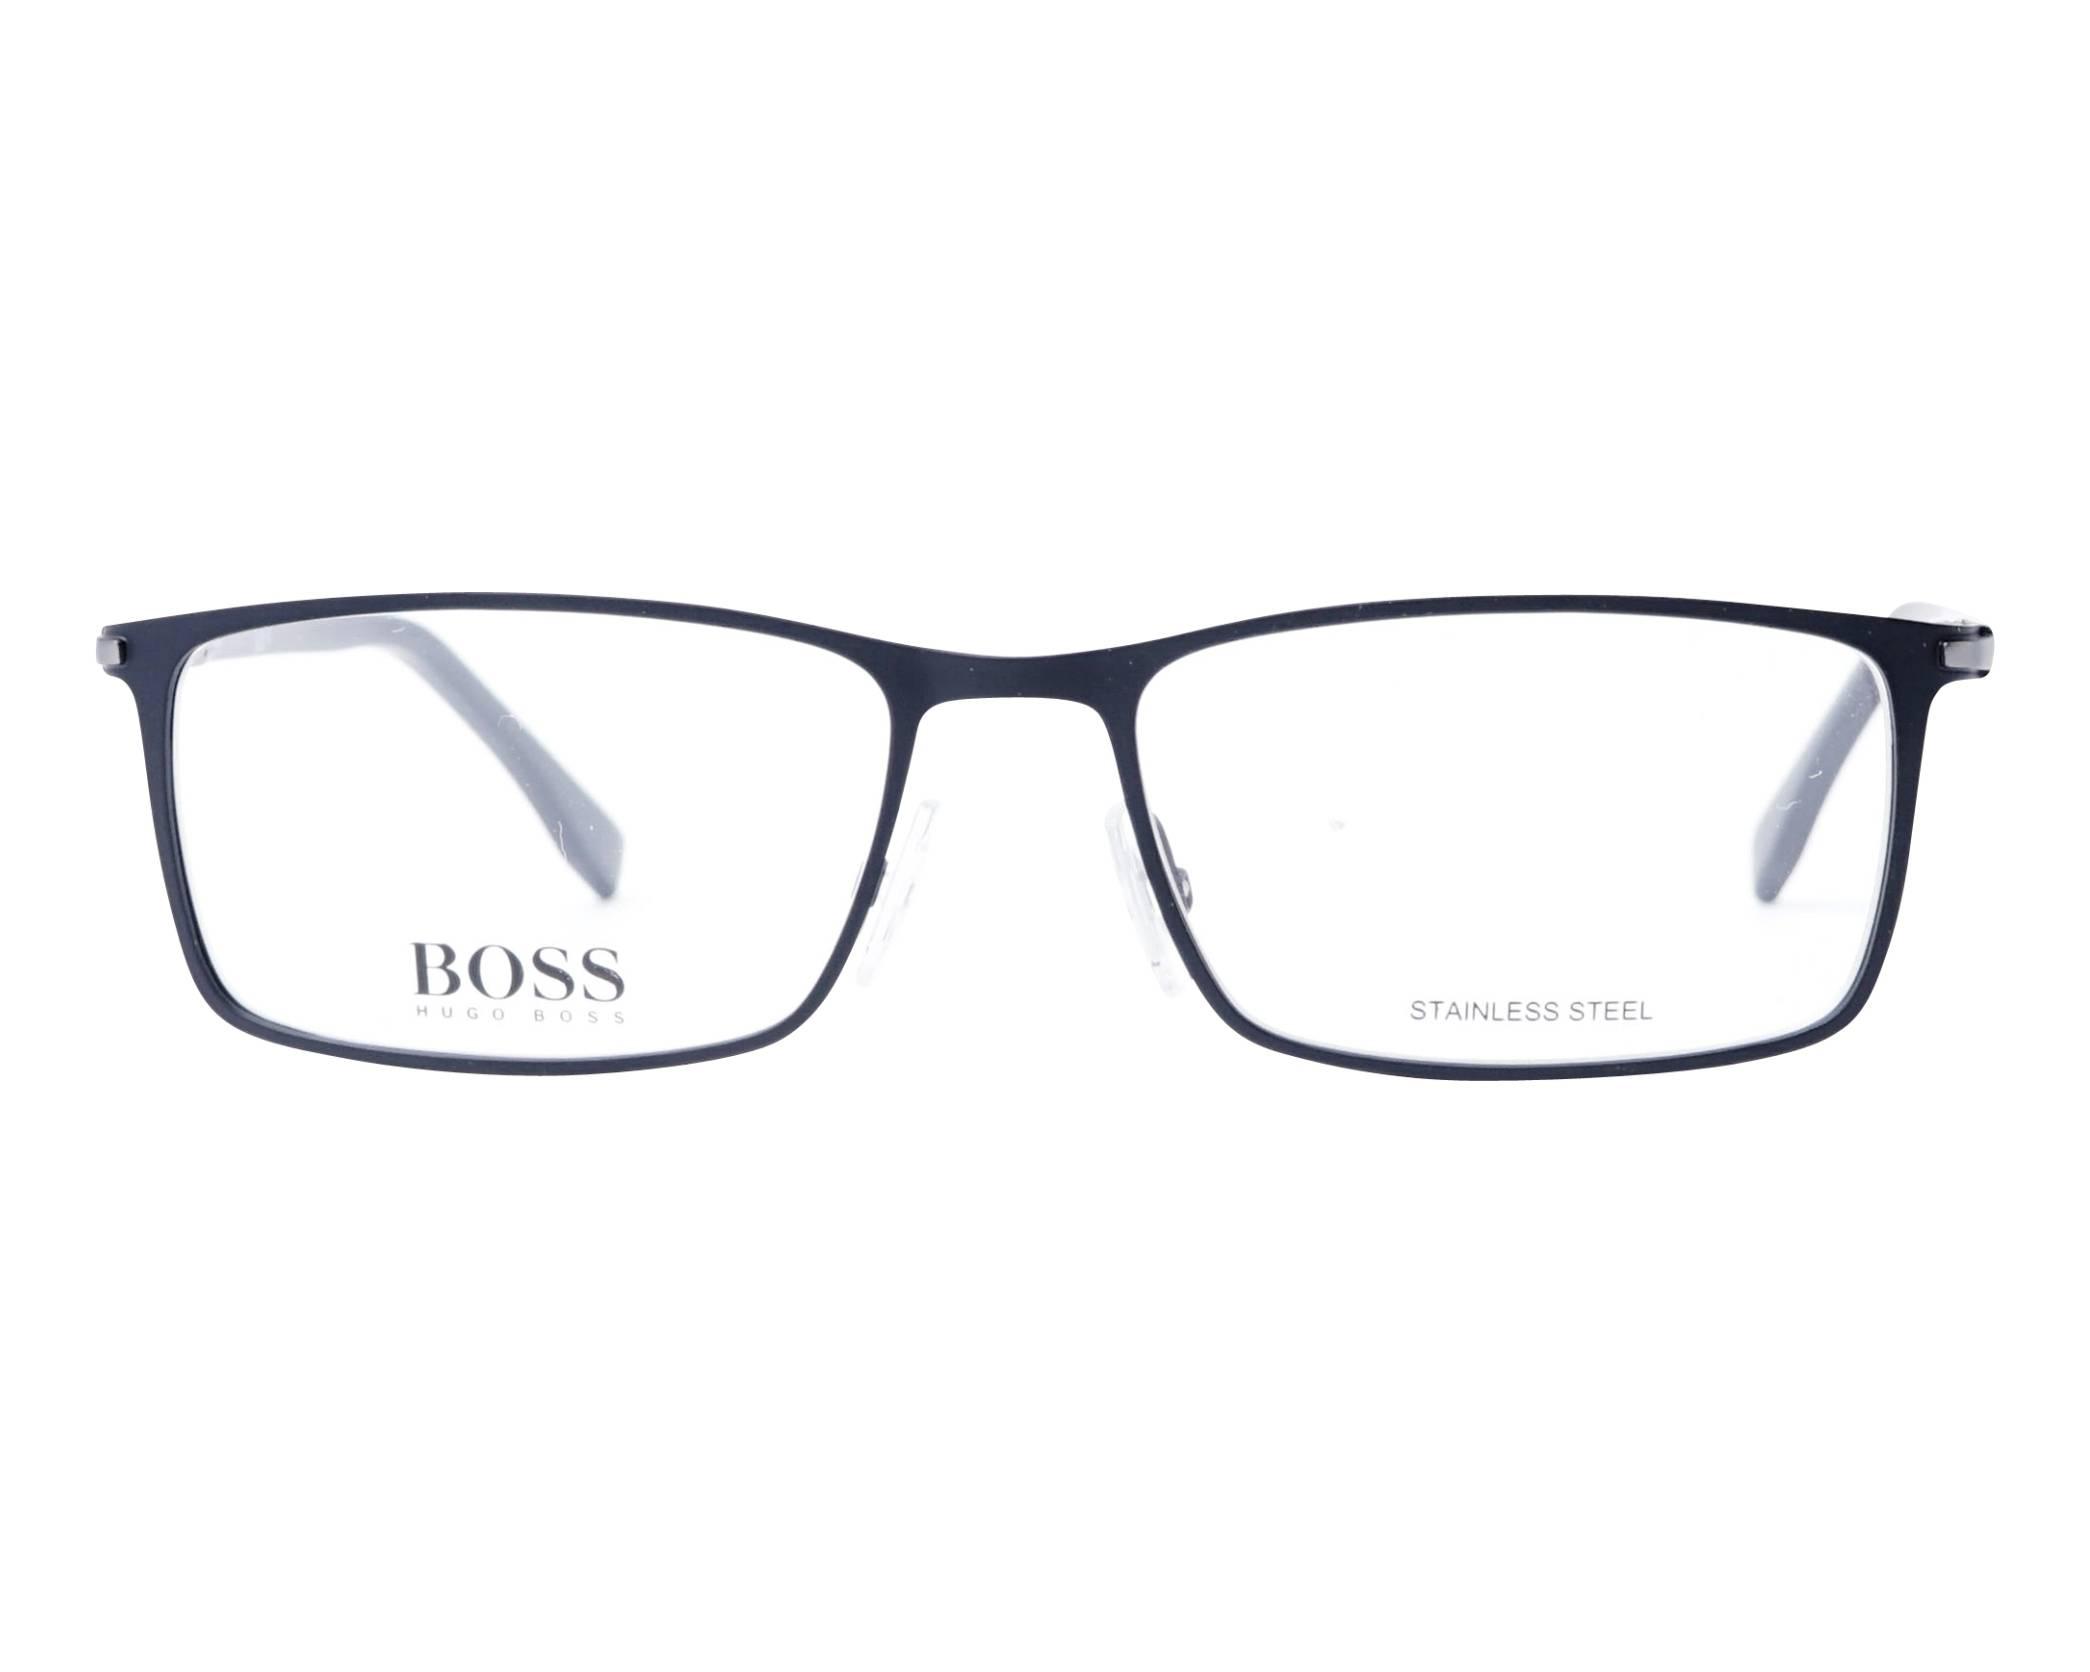 ecfa40c05498 eyeglasses Hugo Boss BOSS-1006 003 57-17 Black front view